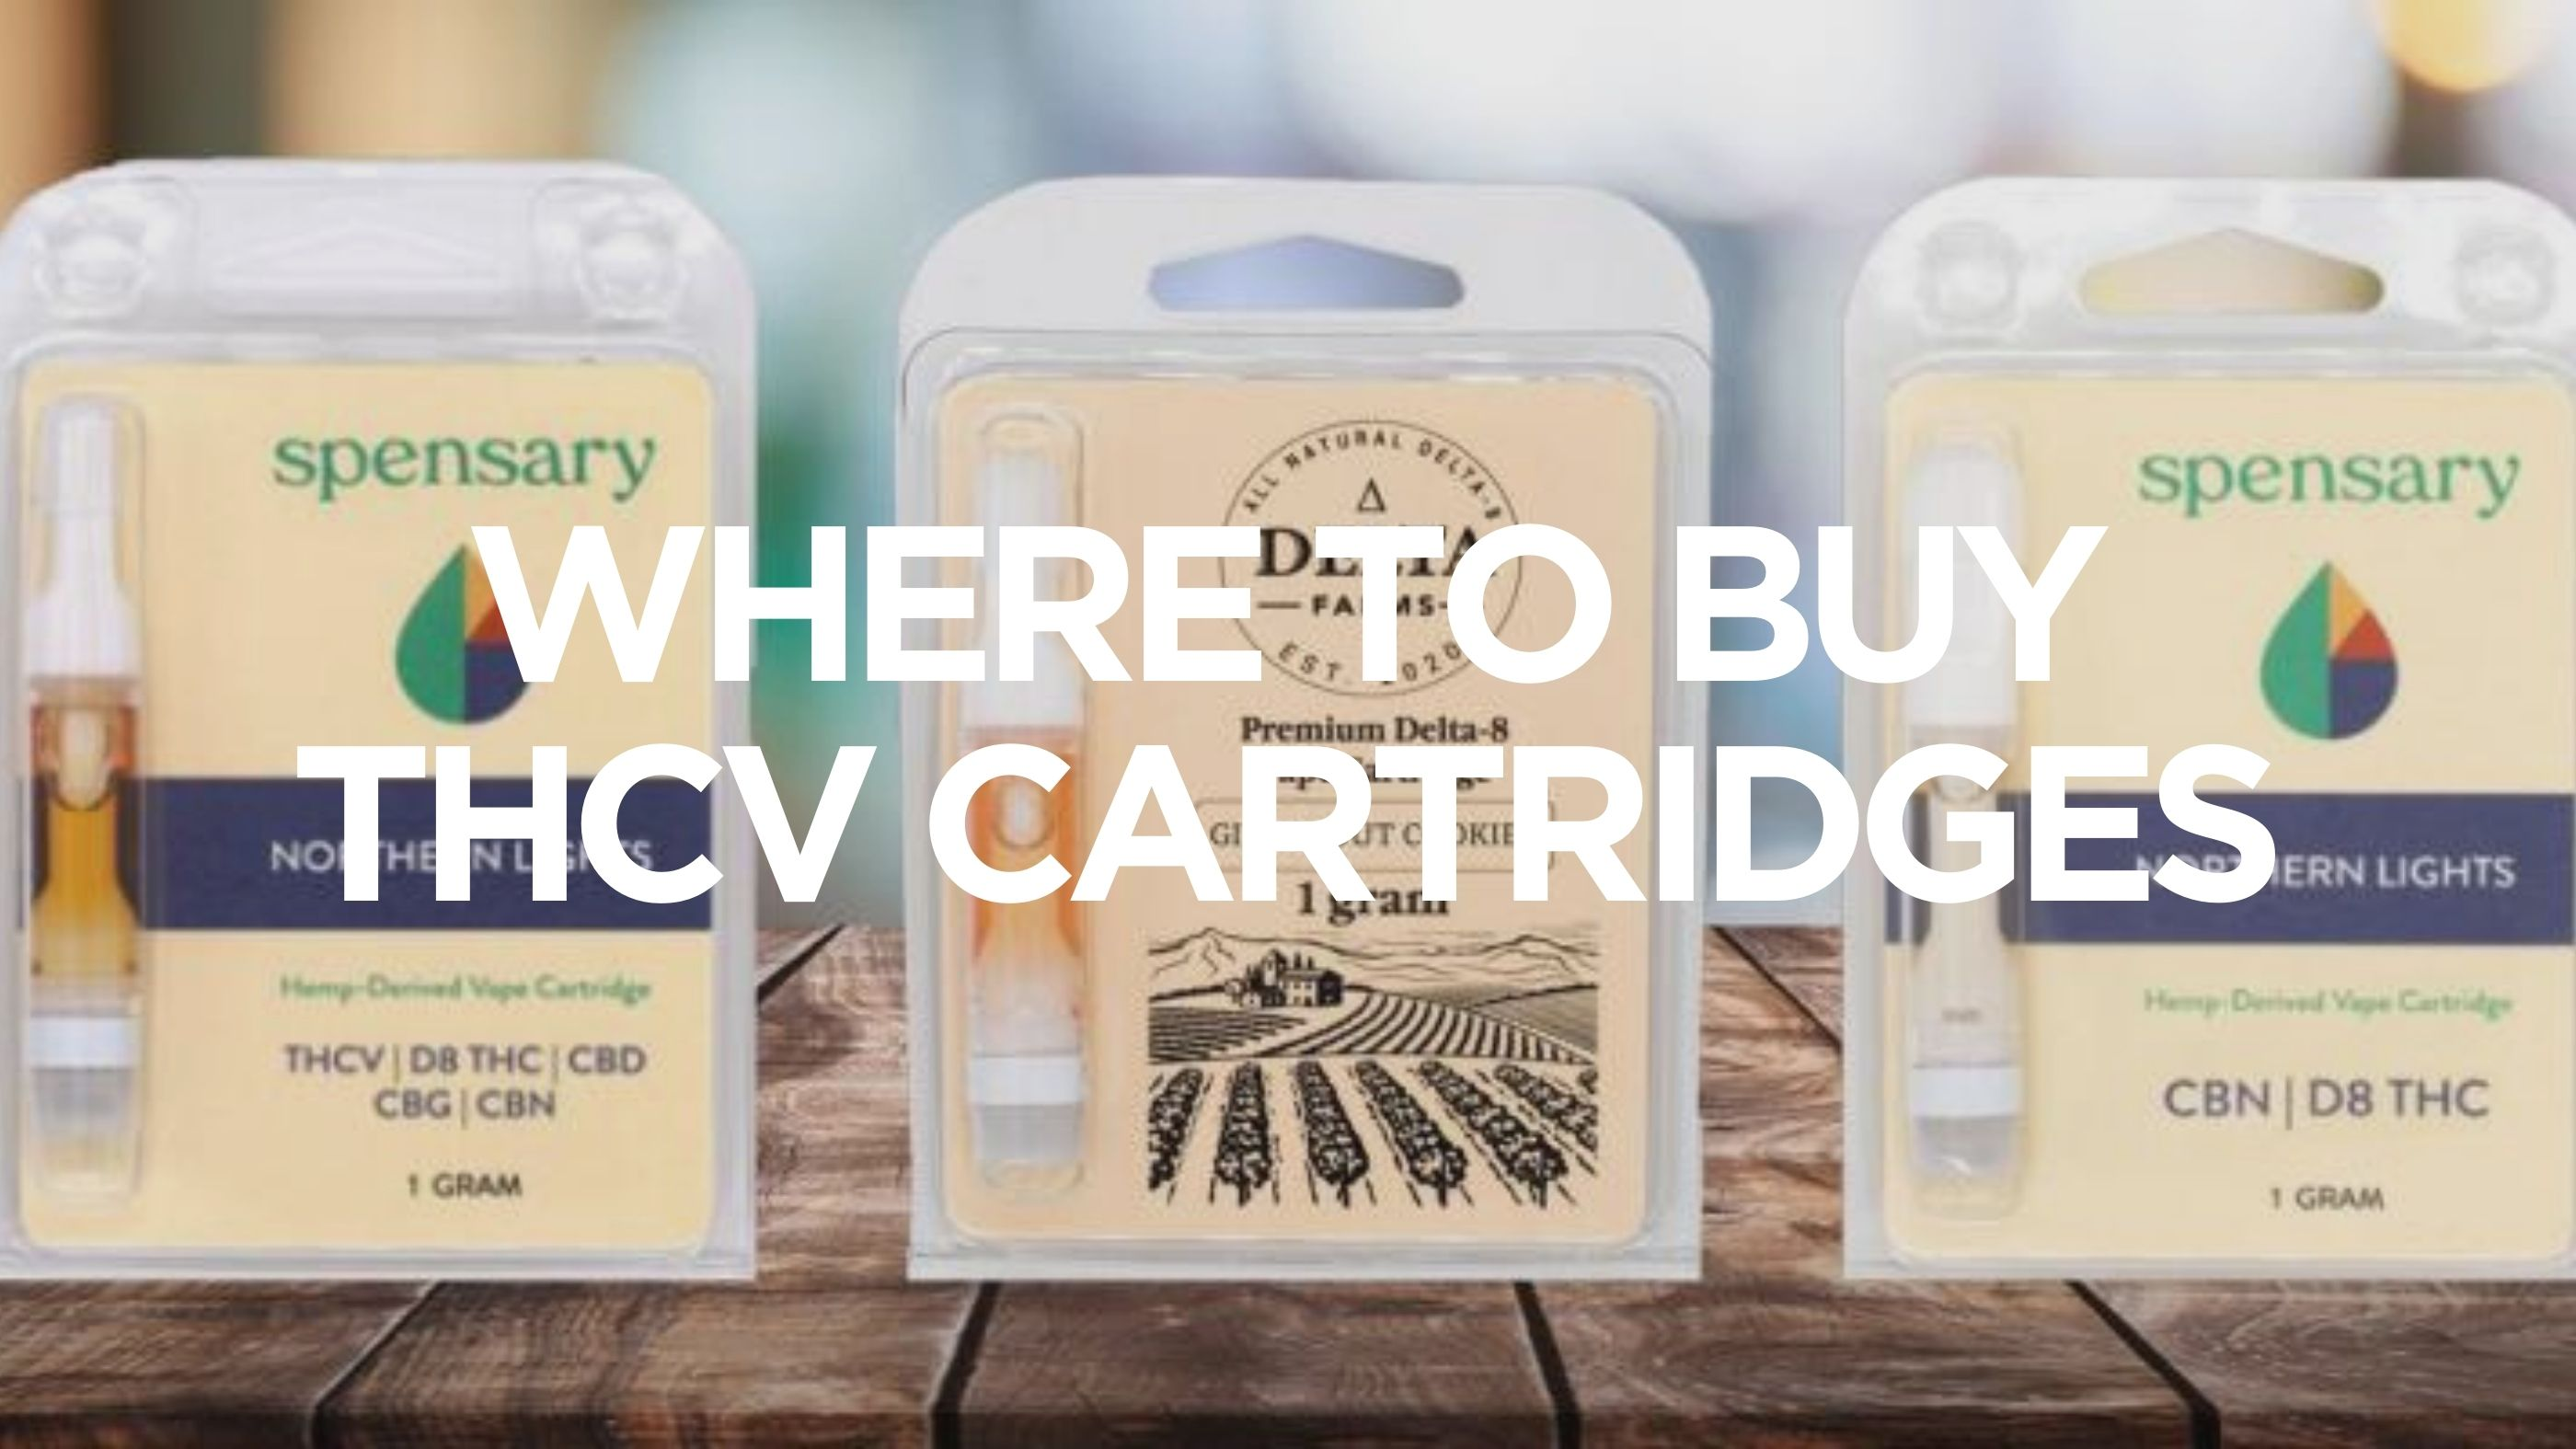 Where to Buy THCV Cartridges